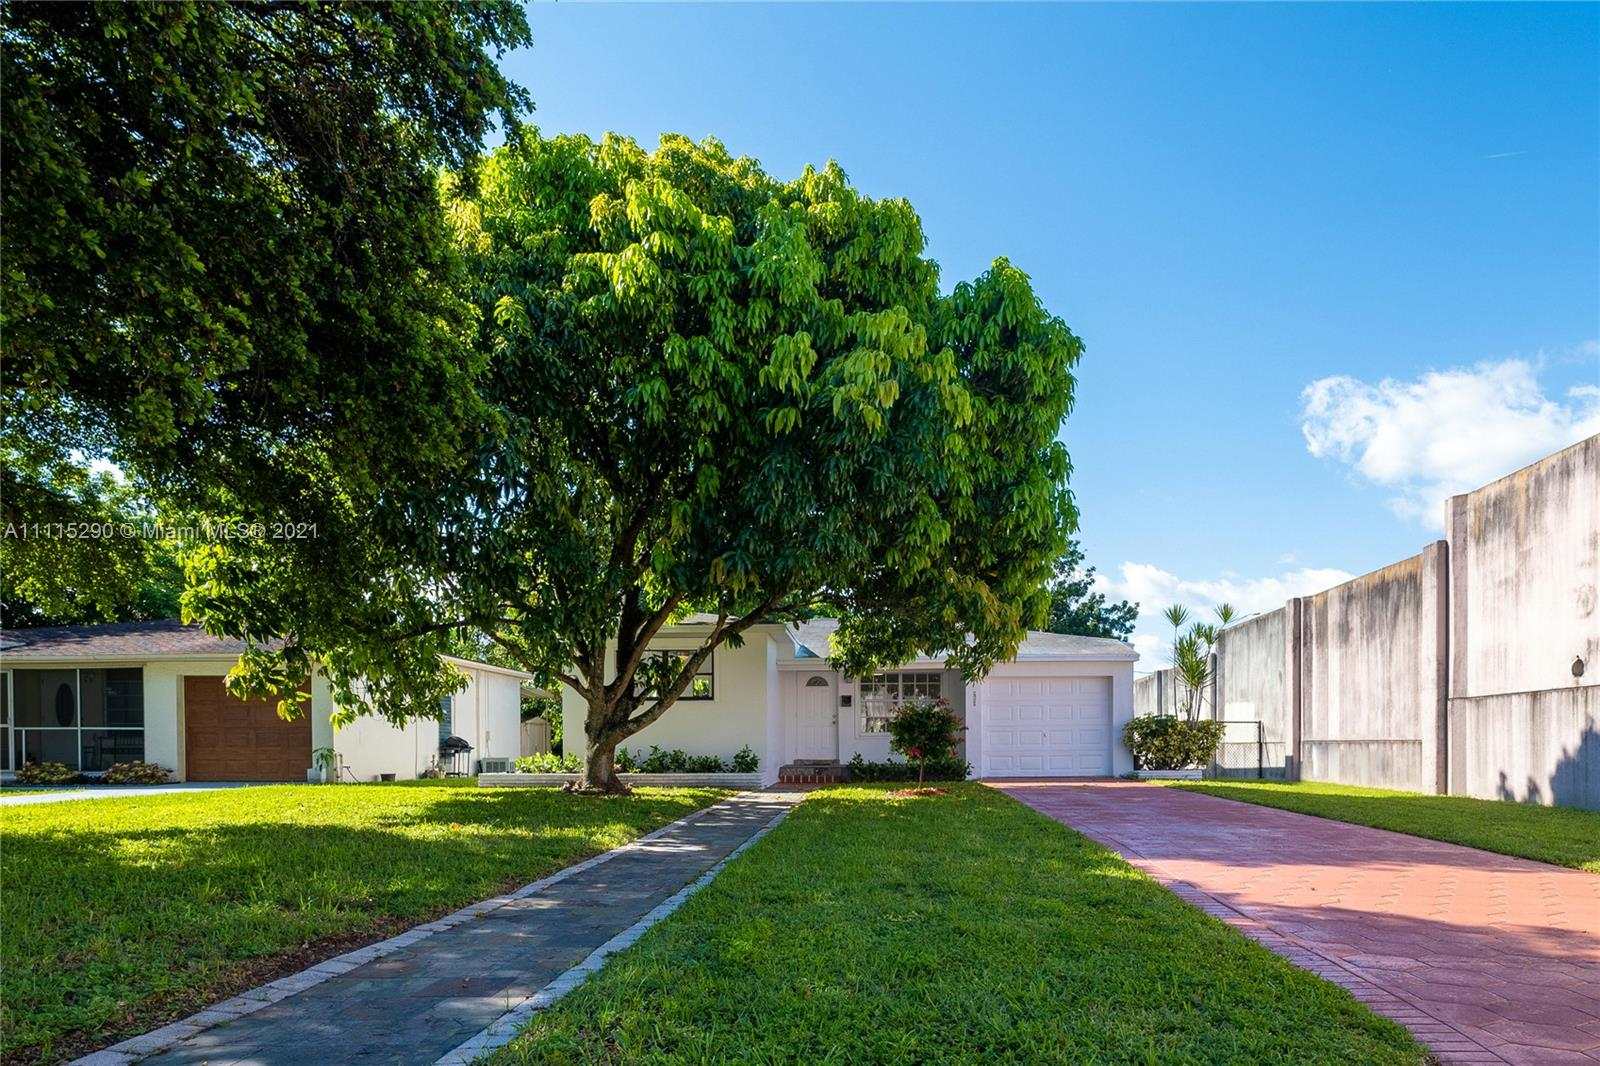 Hollywood Little Ranches - 2926 Monroe St, Hollywood, FL 33020